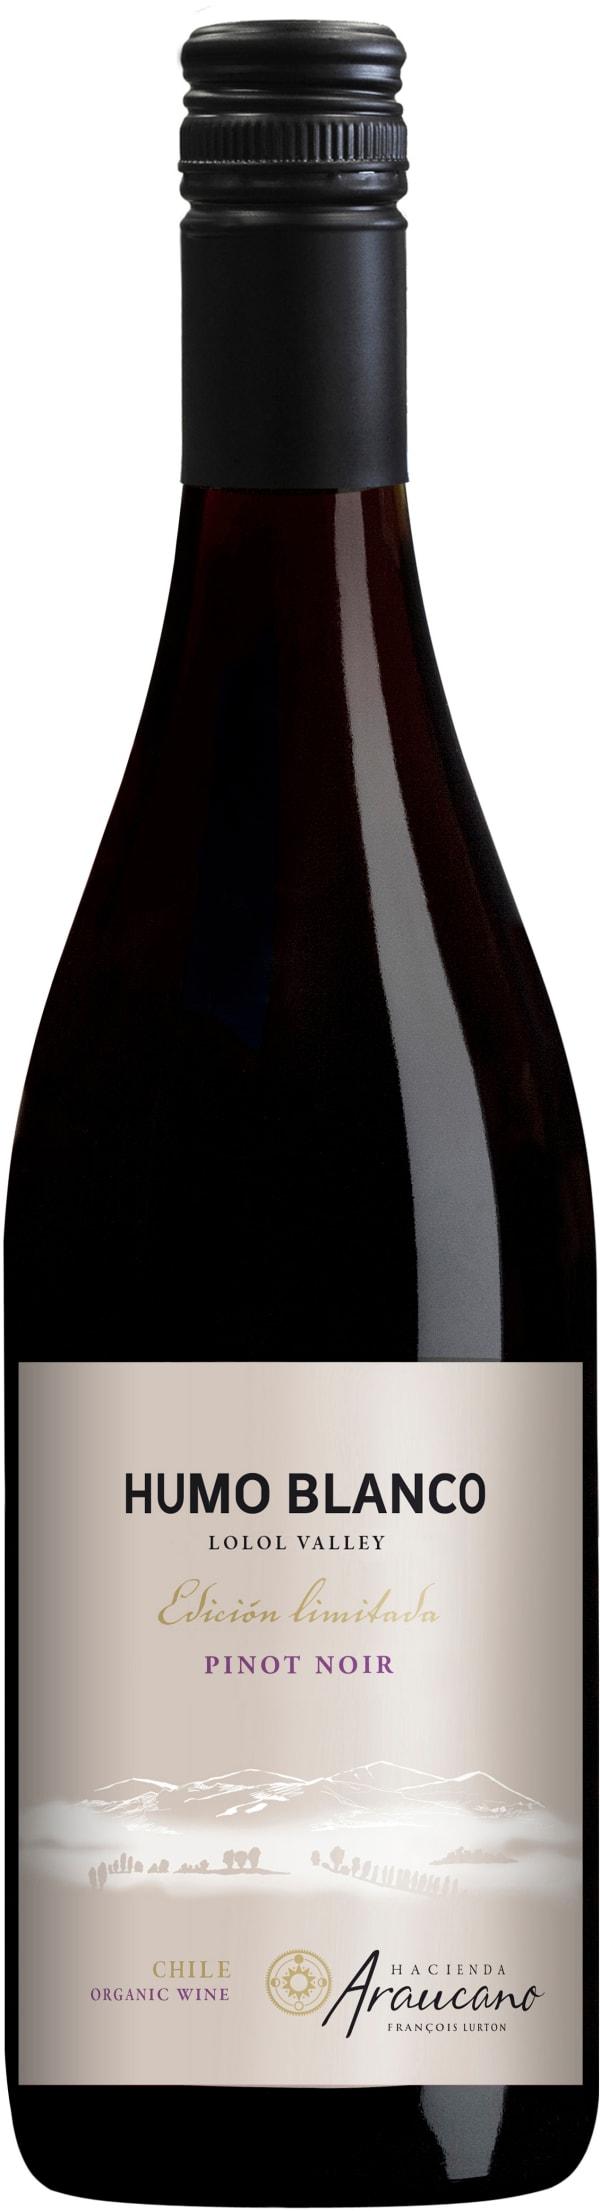 Humo Blanco Edicion Limitada Pinot Noir 2018